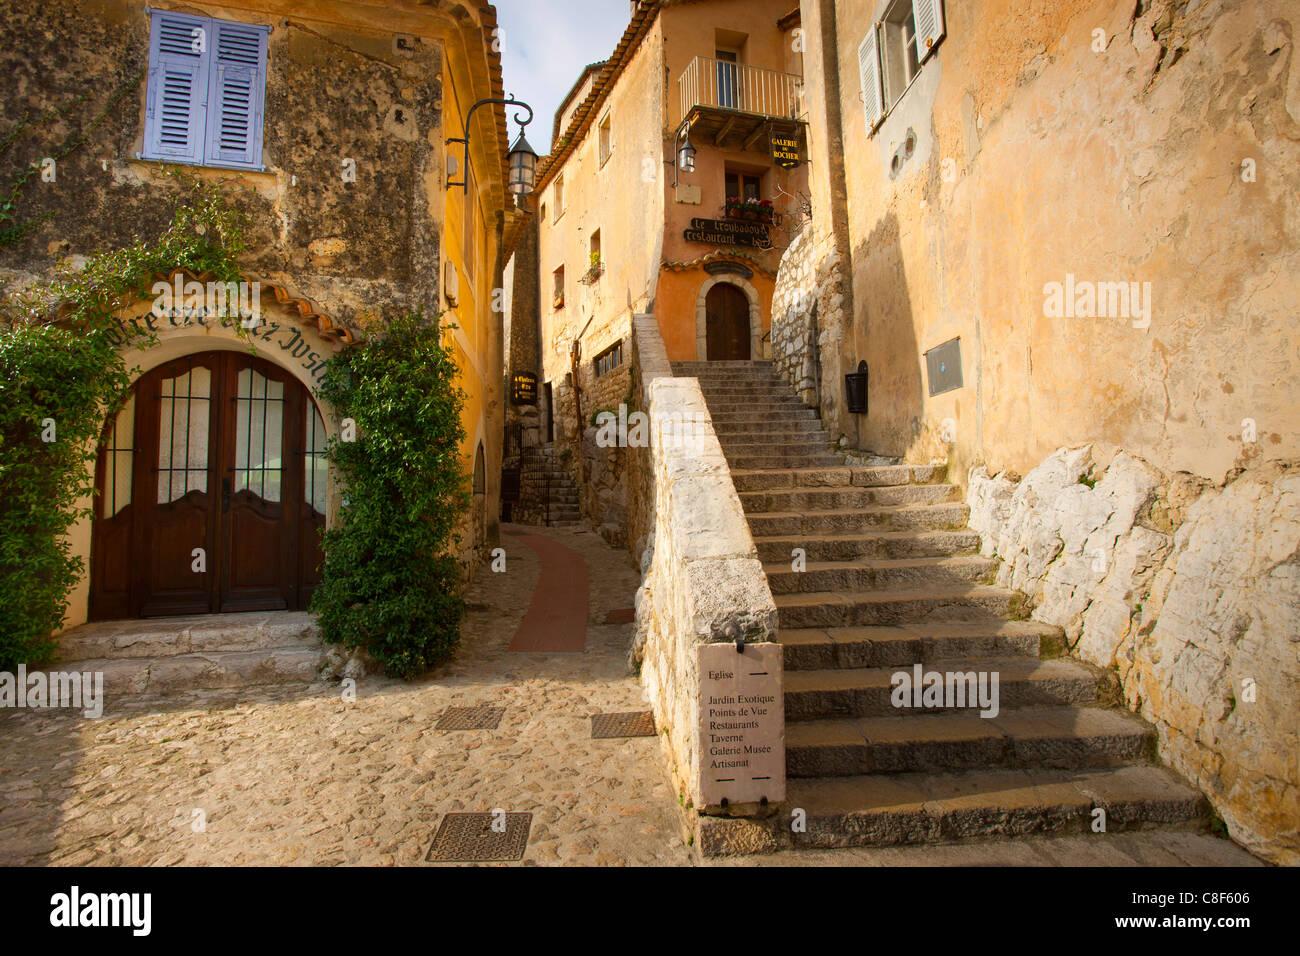 Eze, Francia, Europa, Côte d'Azur, Provenza, Alpes-Maritimes, aldea, casas, casas, Lane, escalera Imagen De Stock